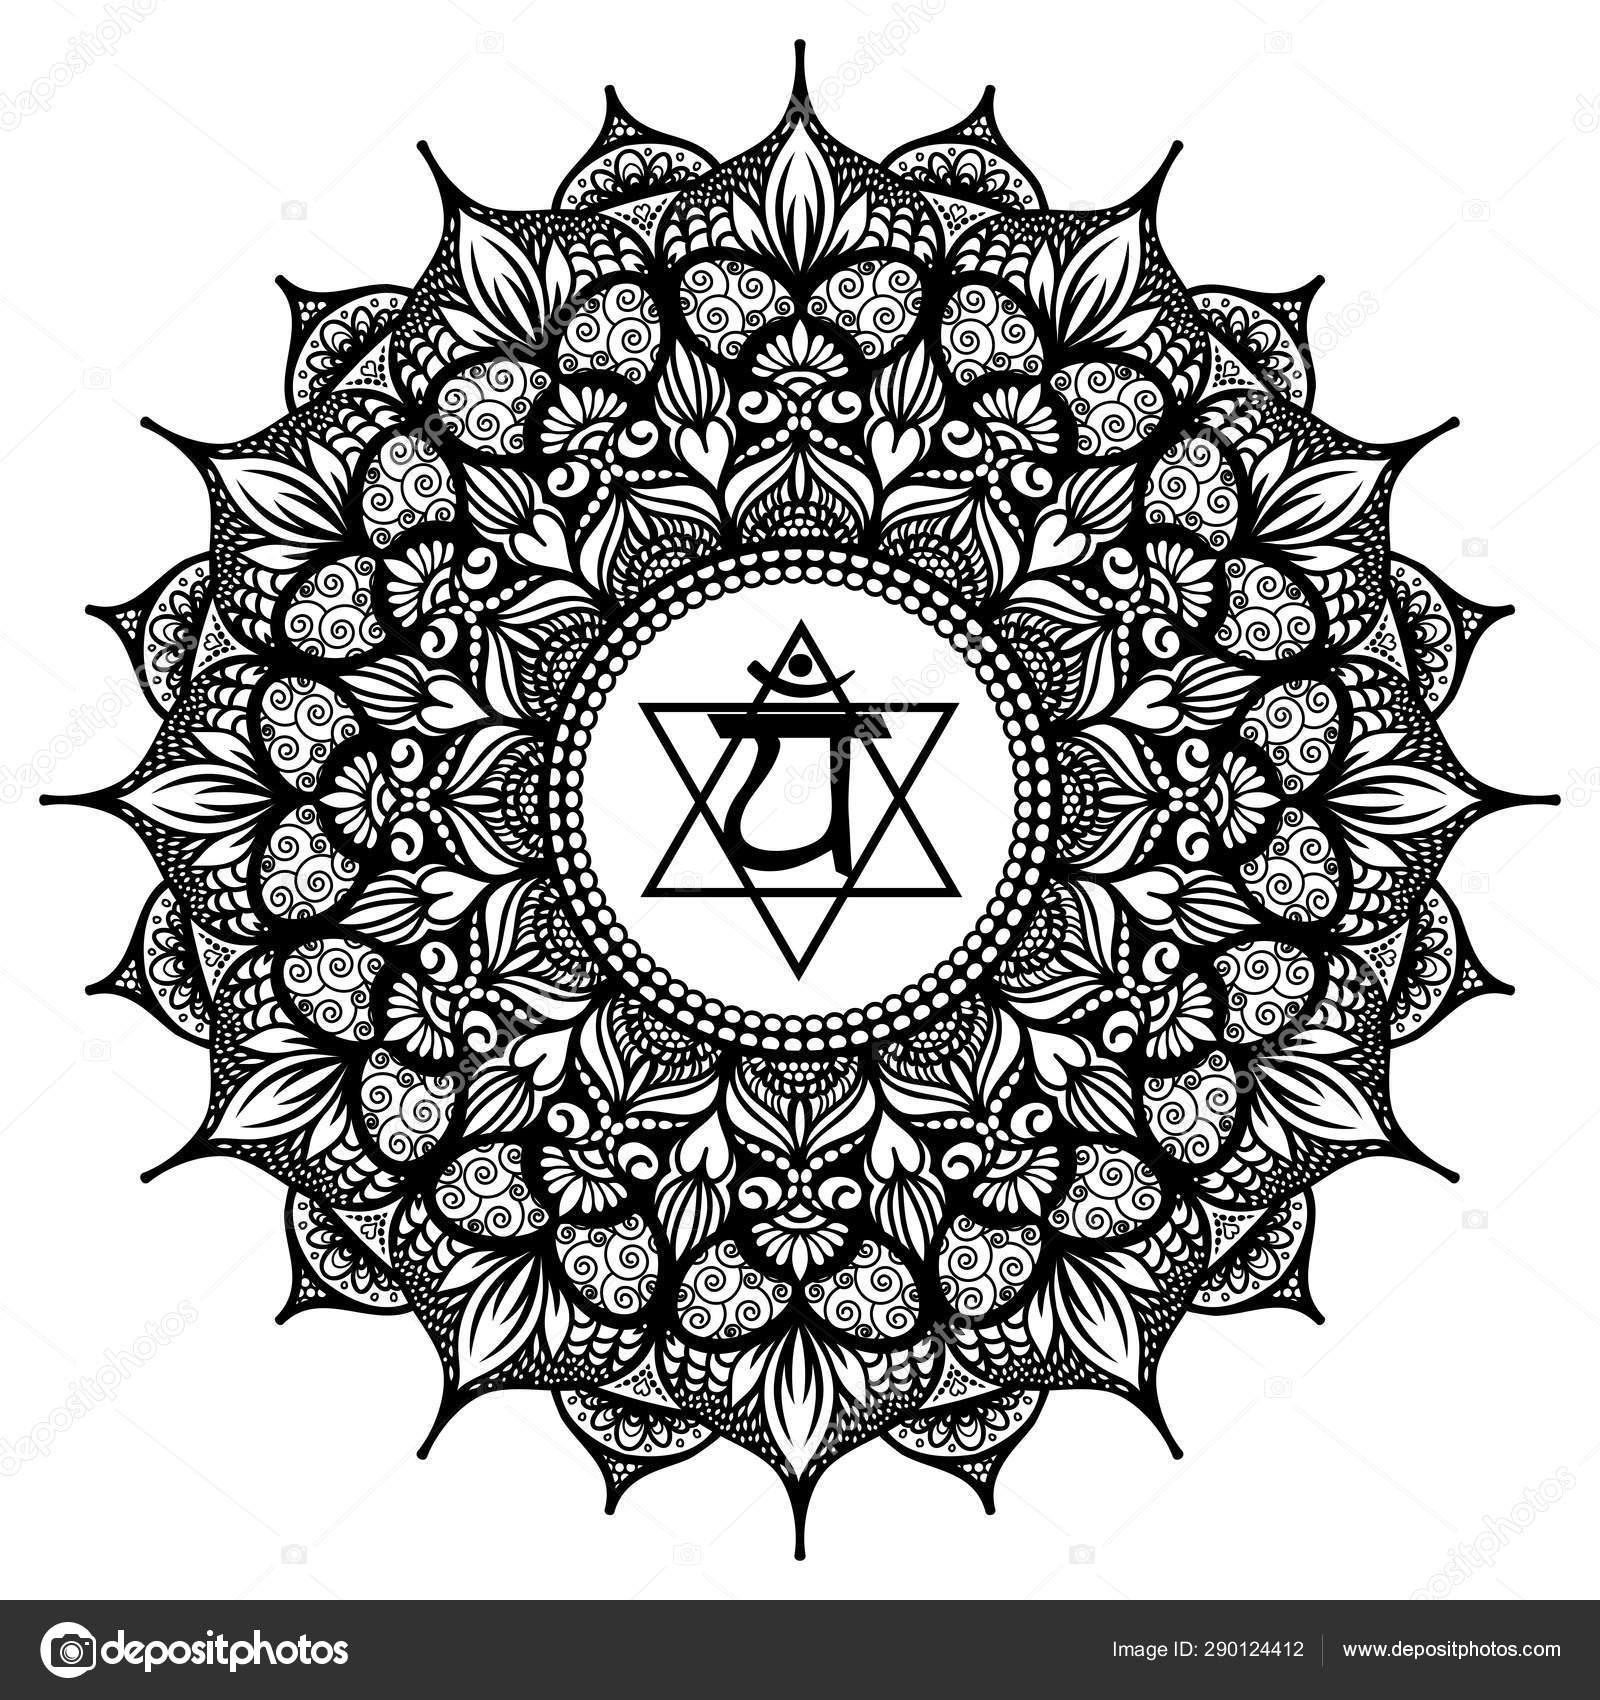 Heart Mandala Chakra Coloring Page Stock Photo Image By C Smk0473 290124412